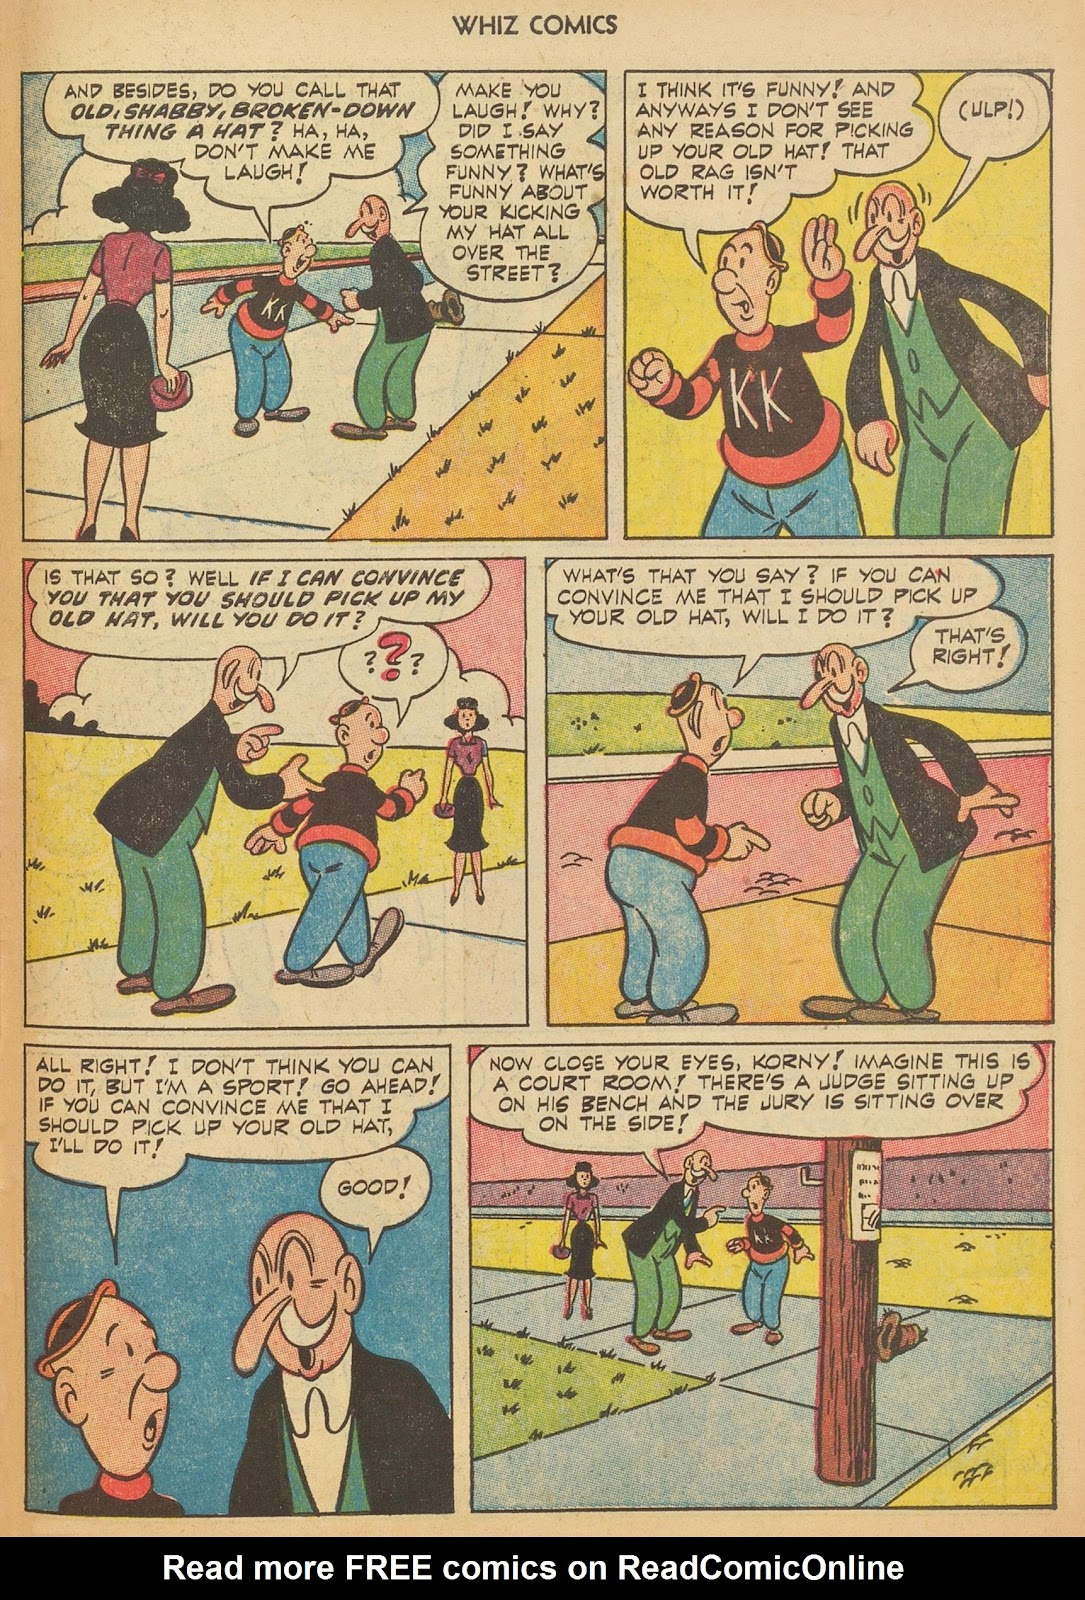 Read online WHIZ Comics comic -  Issue #153 - 27